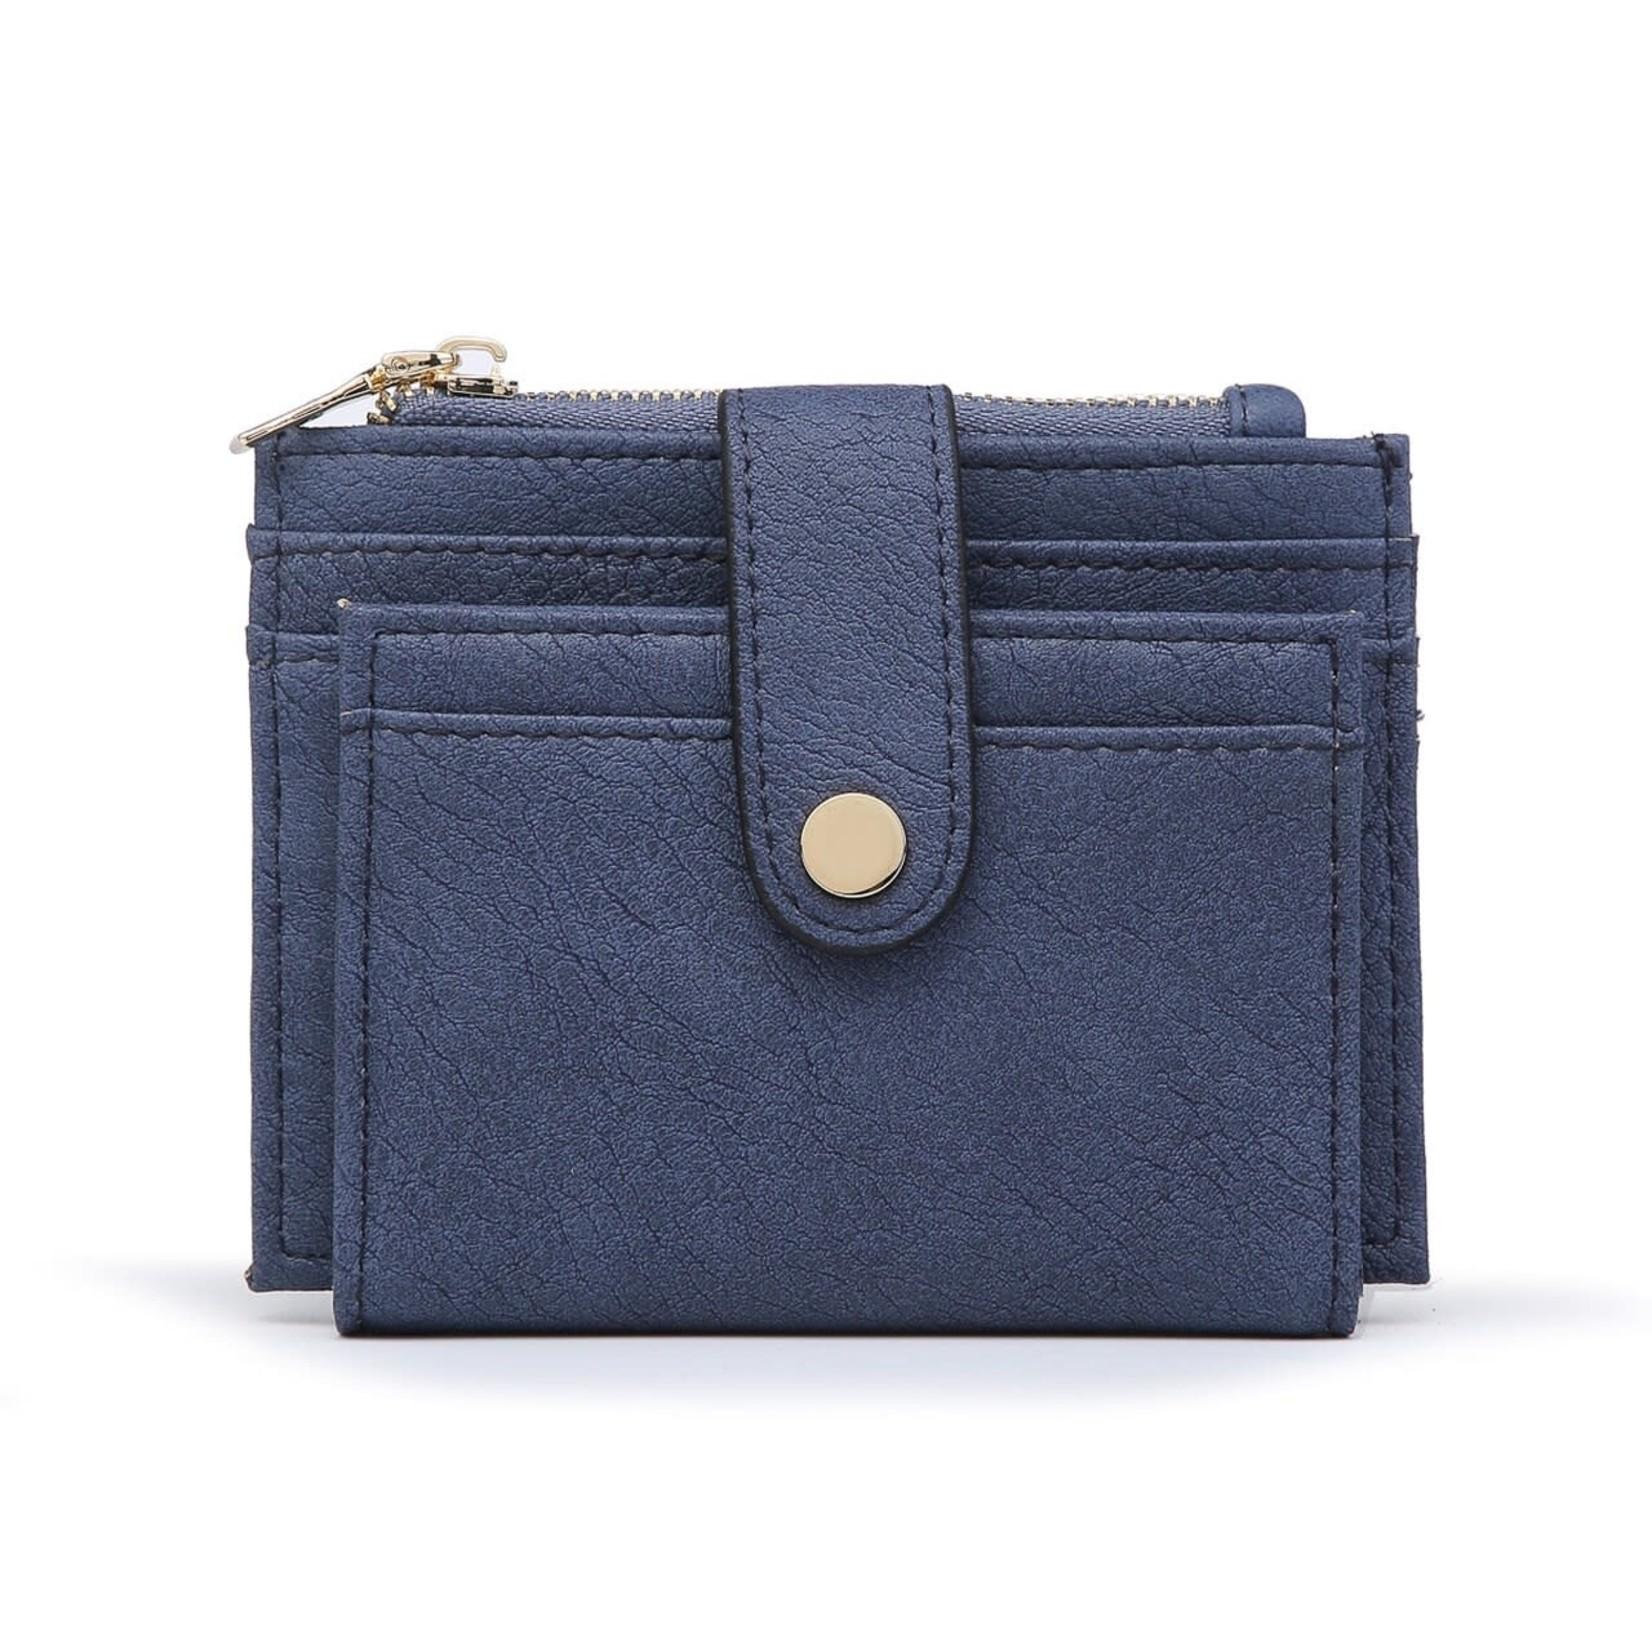 Dark Blue Wallet/Credit Card Holder in Vegan Leather